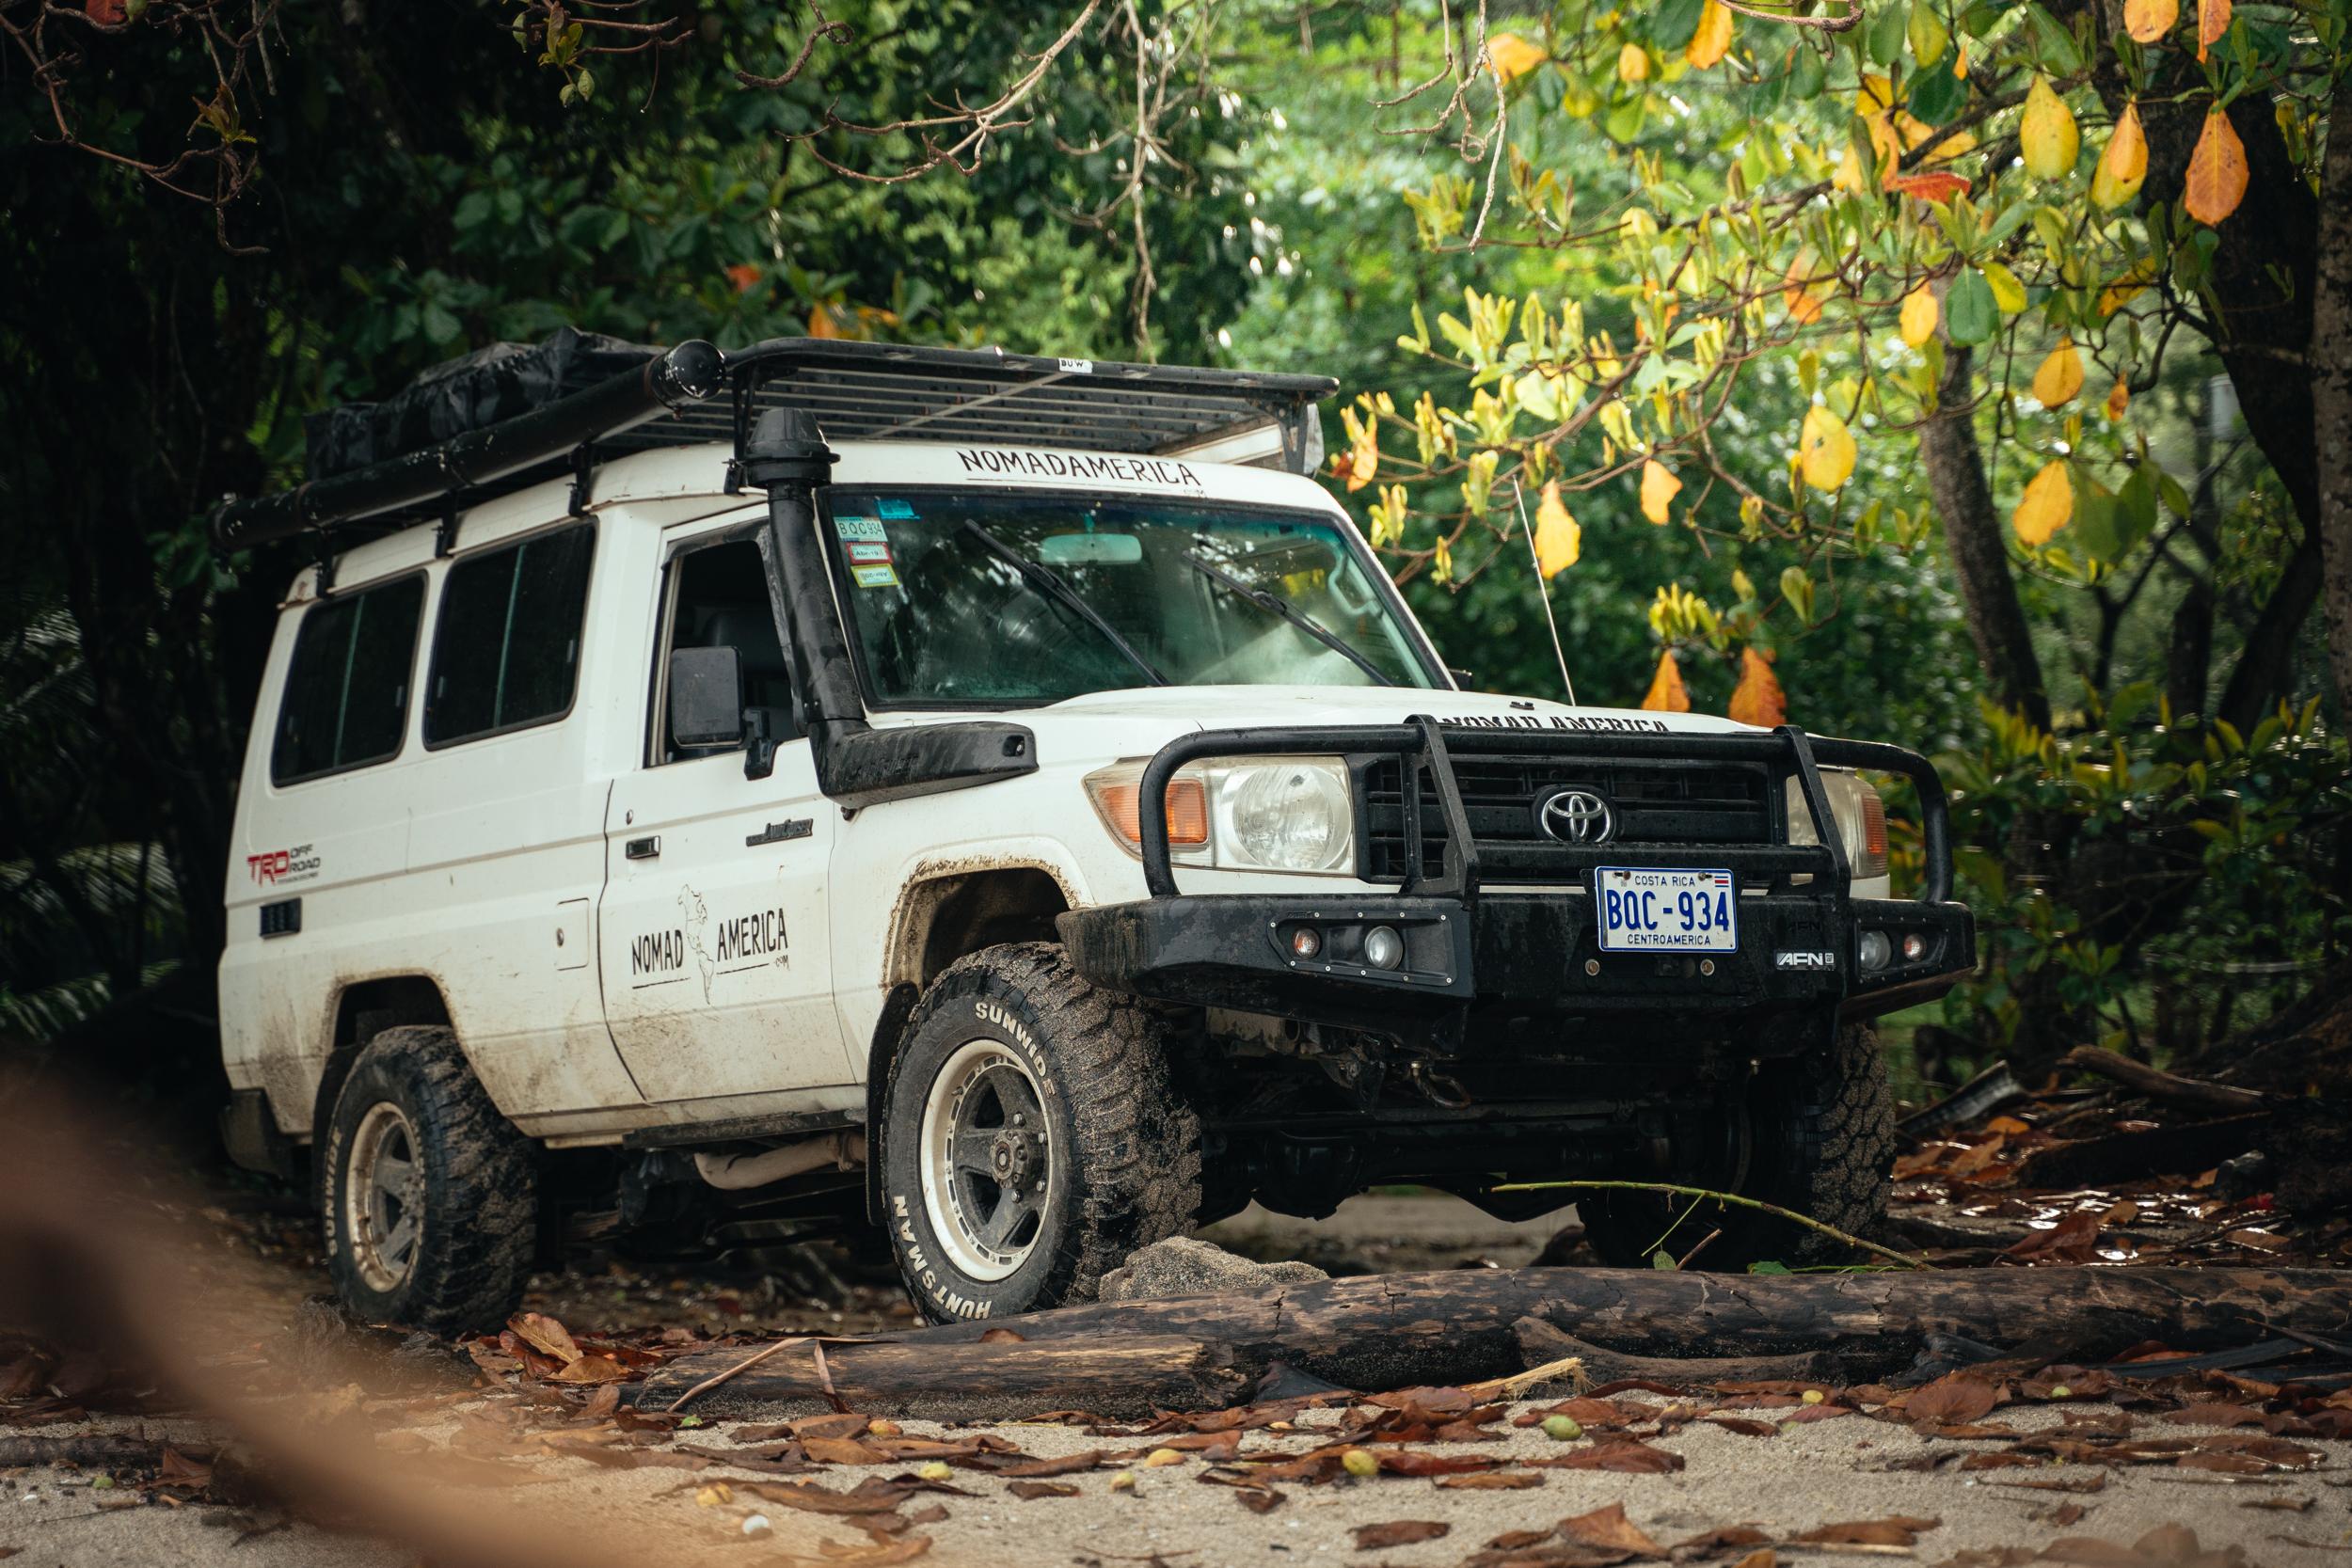 Nomad America 4×4 Car Rental Costa Rica and Panama – Nomad